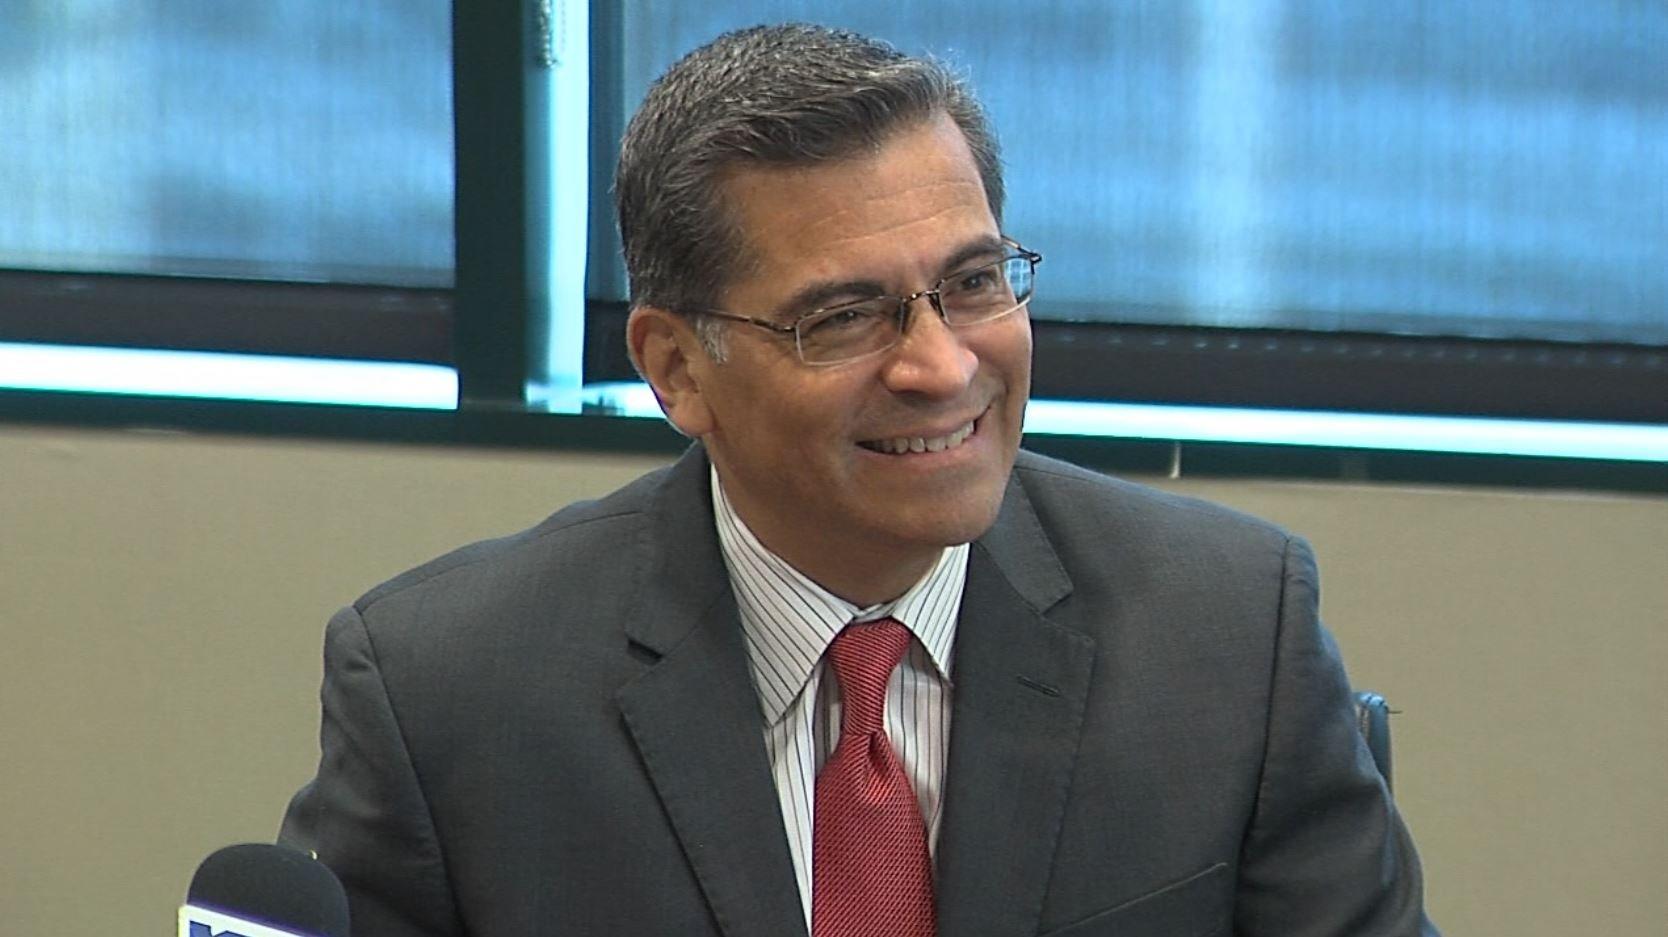 California Attorney General Xavier Bacerra